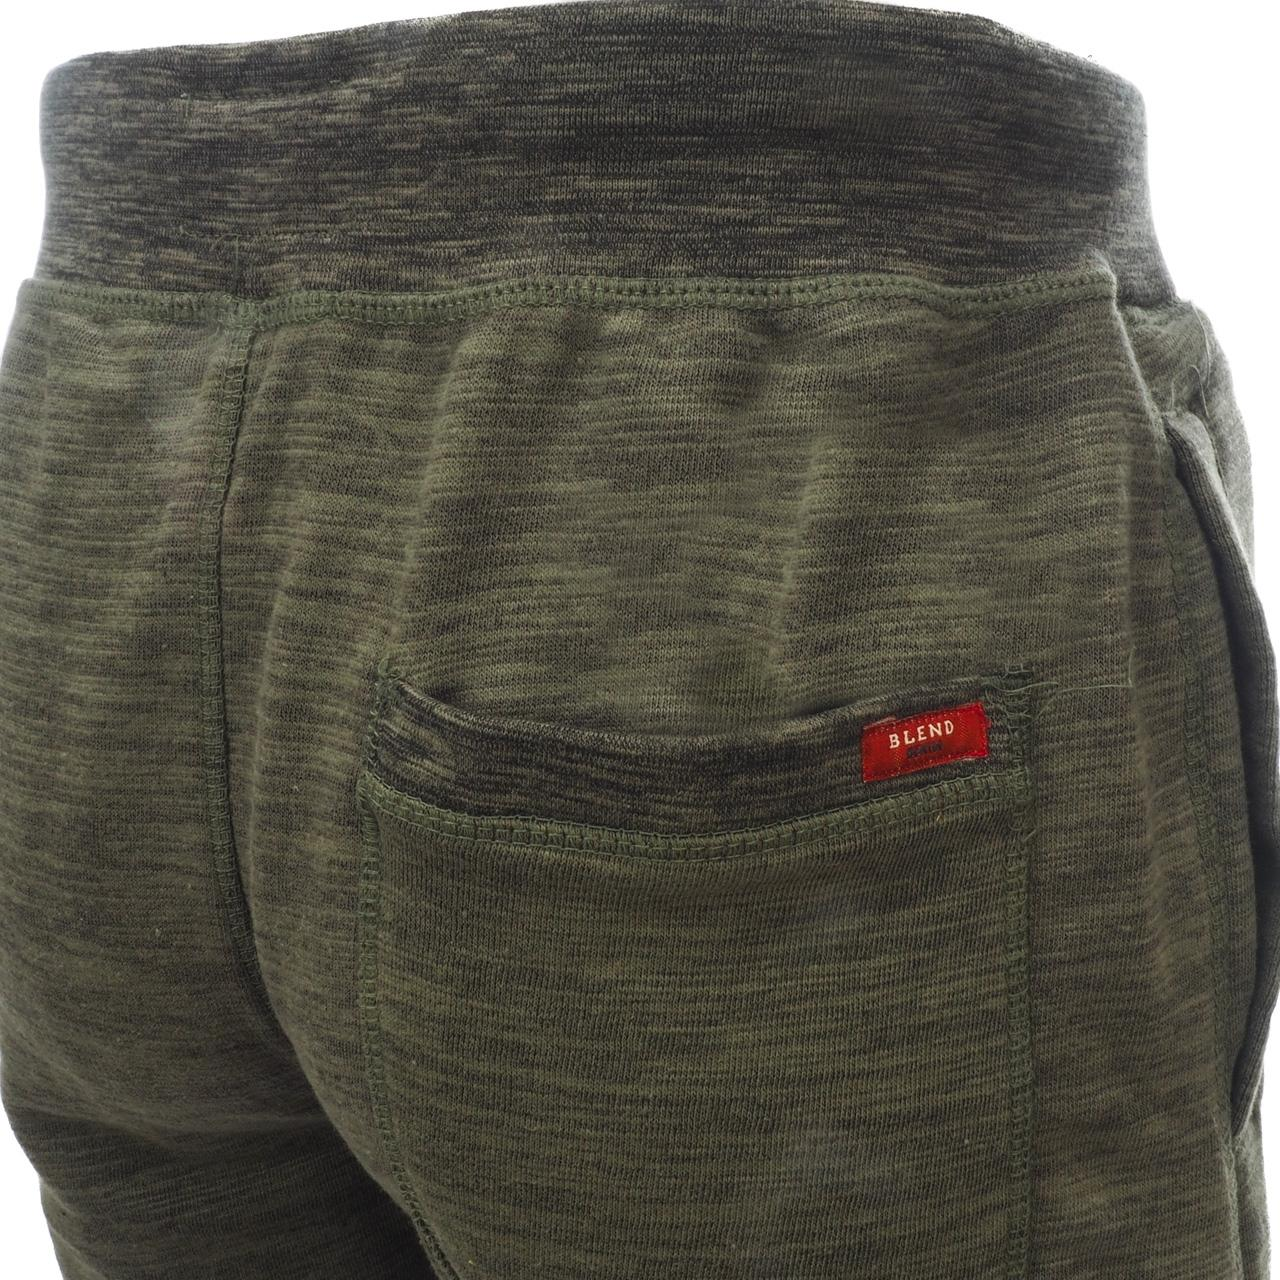 Bermuda-Shorts-Blend-Fadel-Khaki-Sw-Shorts-Green-18064-New thumbnail 3